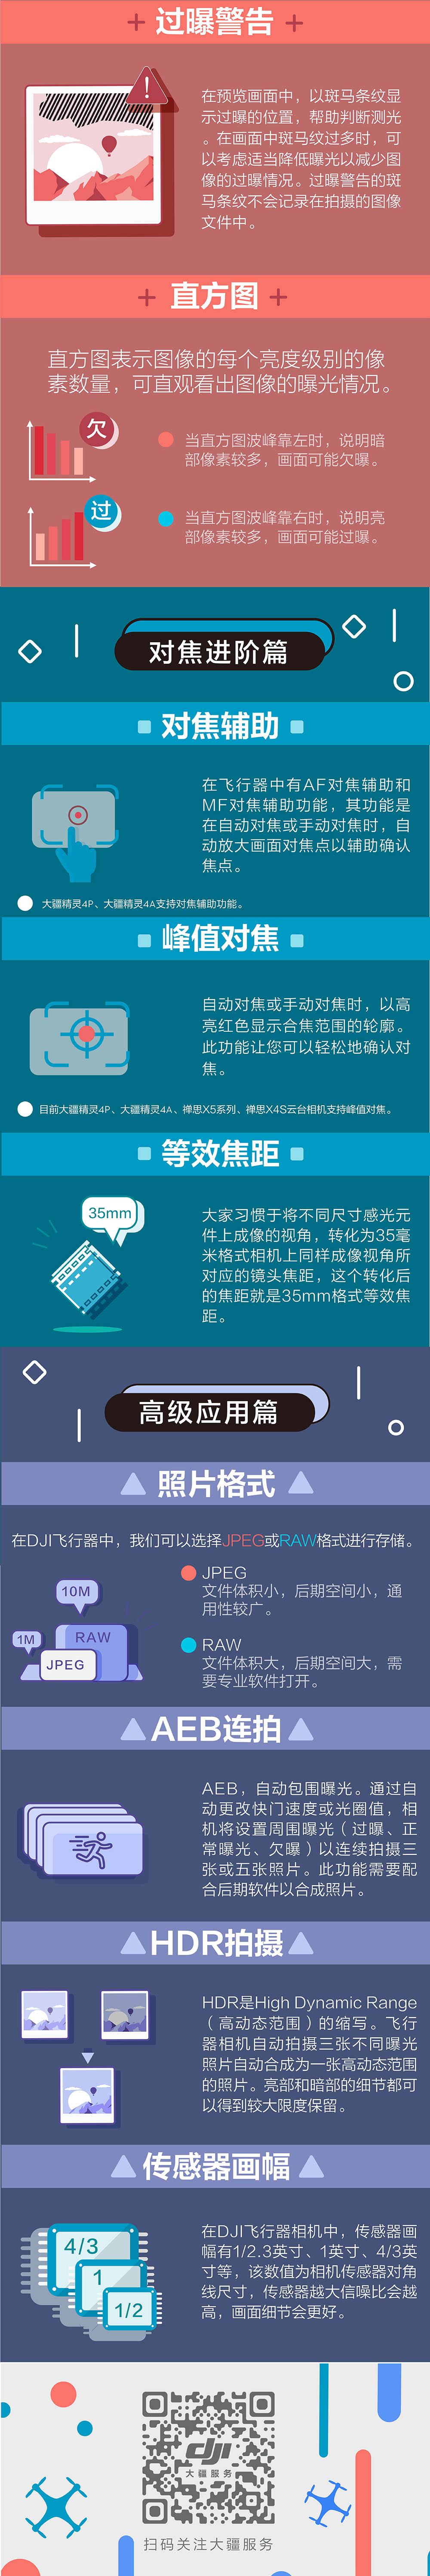 微信插图2.jpg